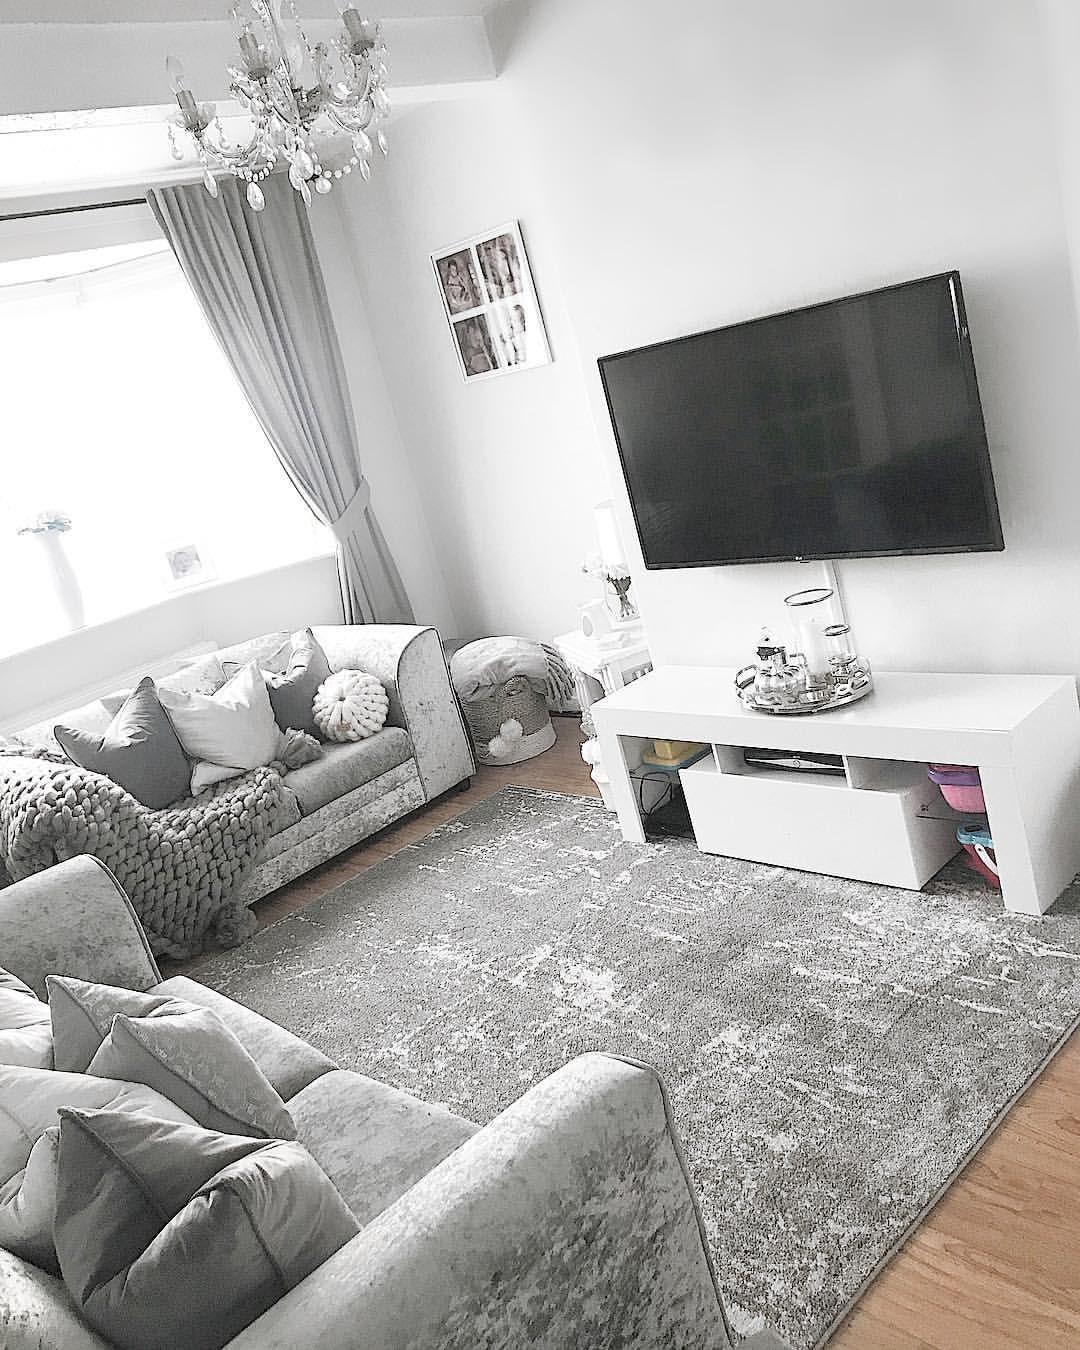 Have A Nice Day Everyone Livingroom Lounge Greydecor Homebargains Baywindow Tv Decor Home Living Room Living Room Decor Gray Living Room Decor Cozy